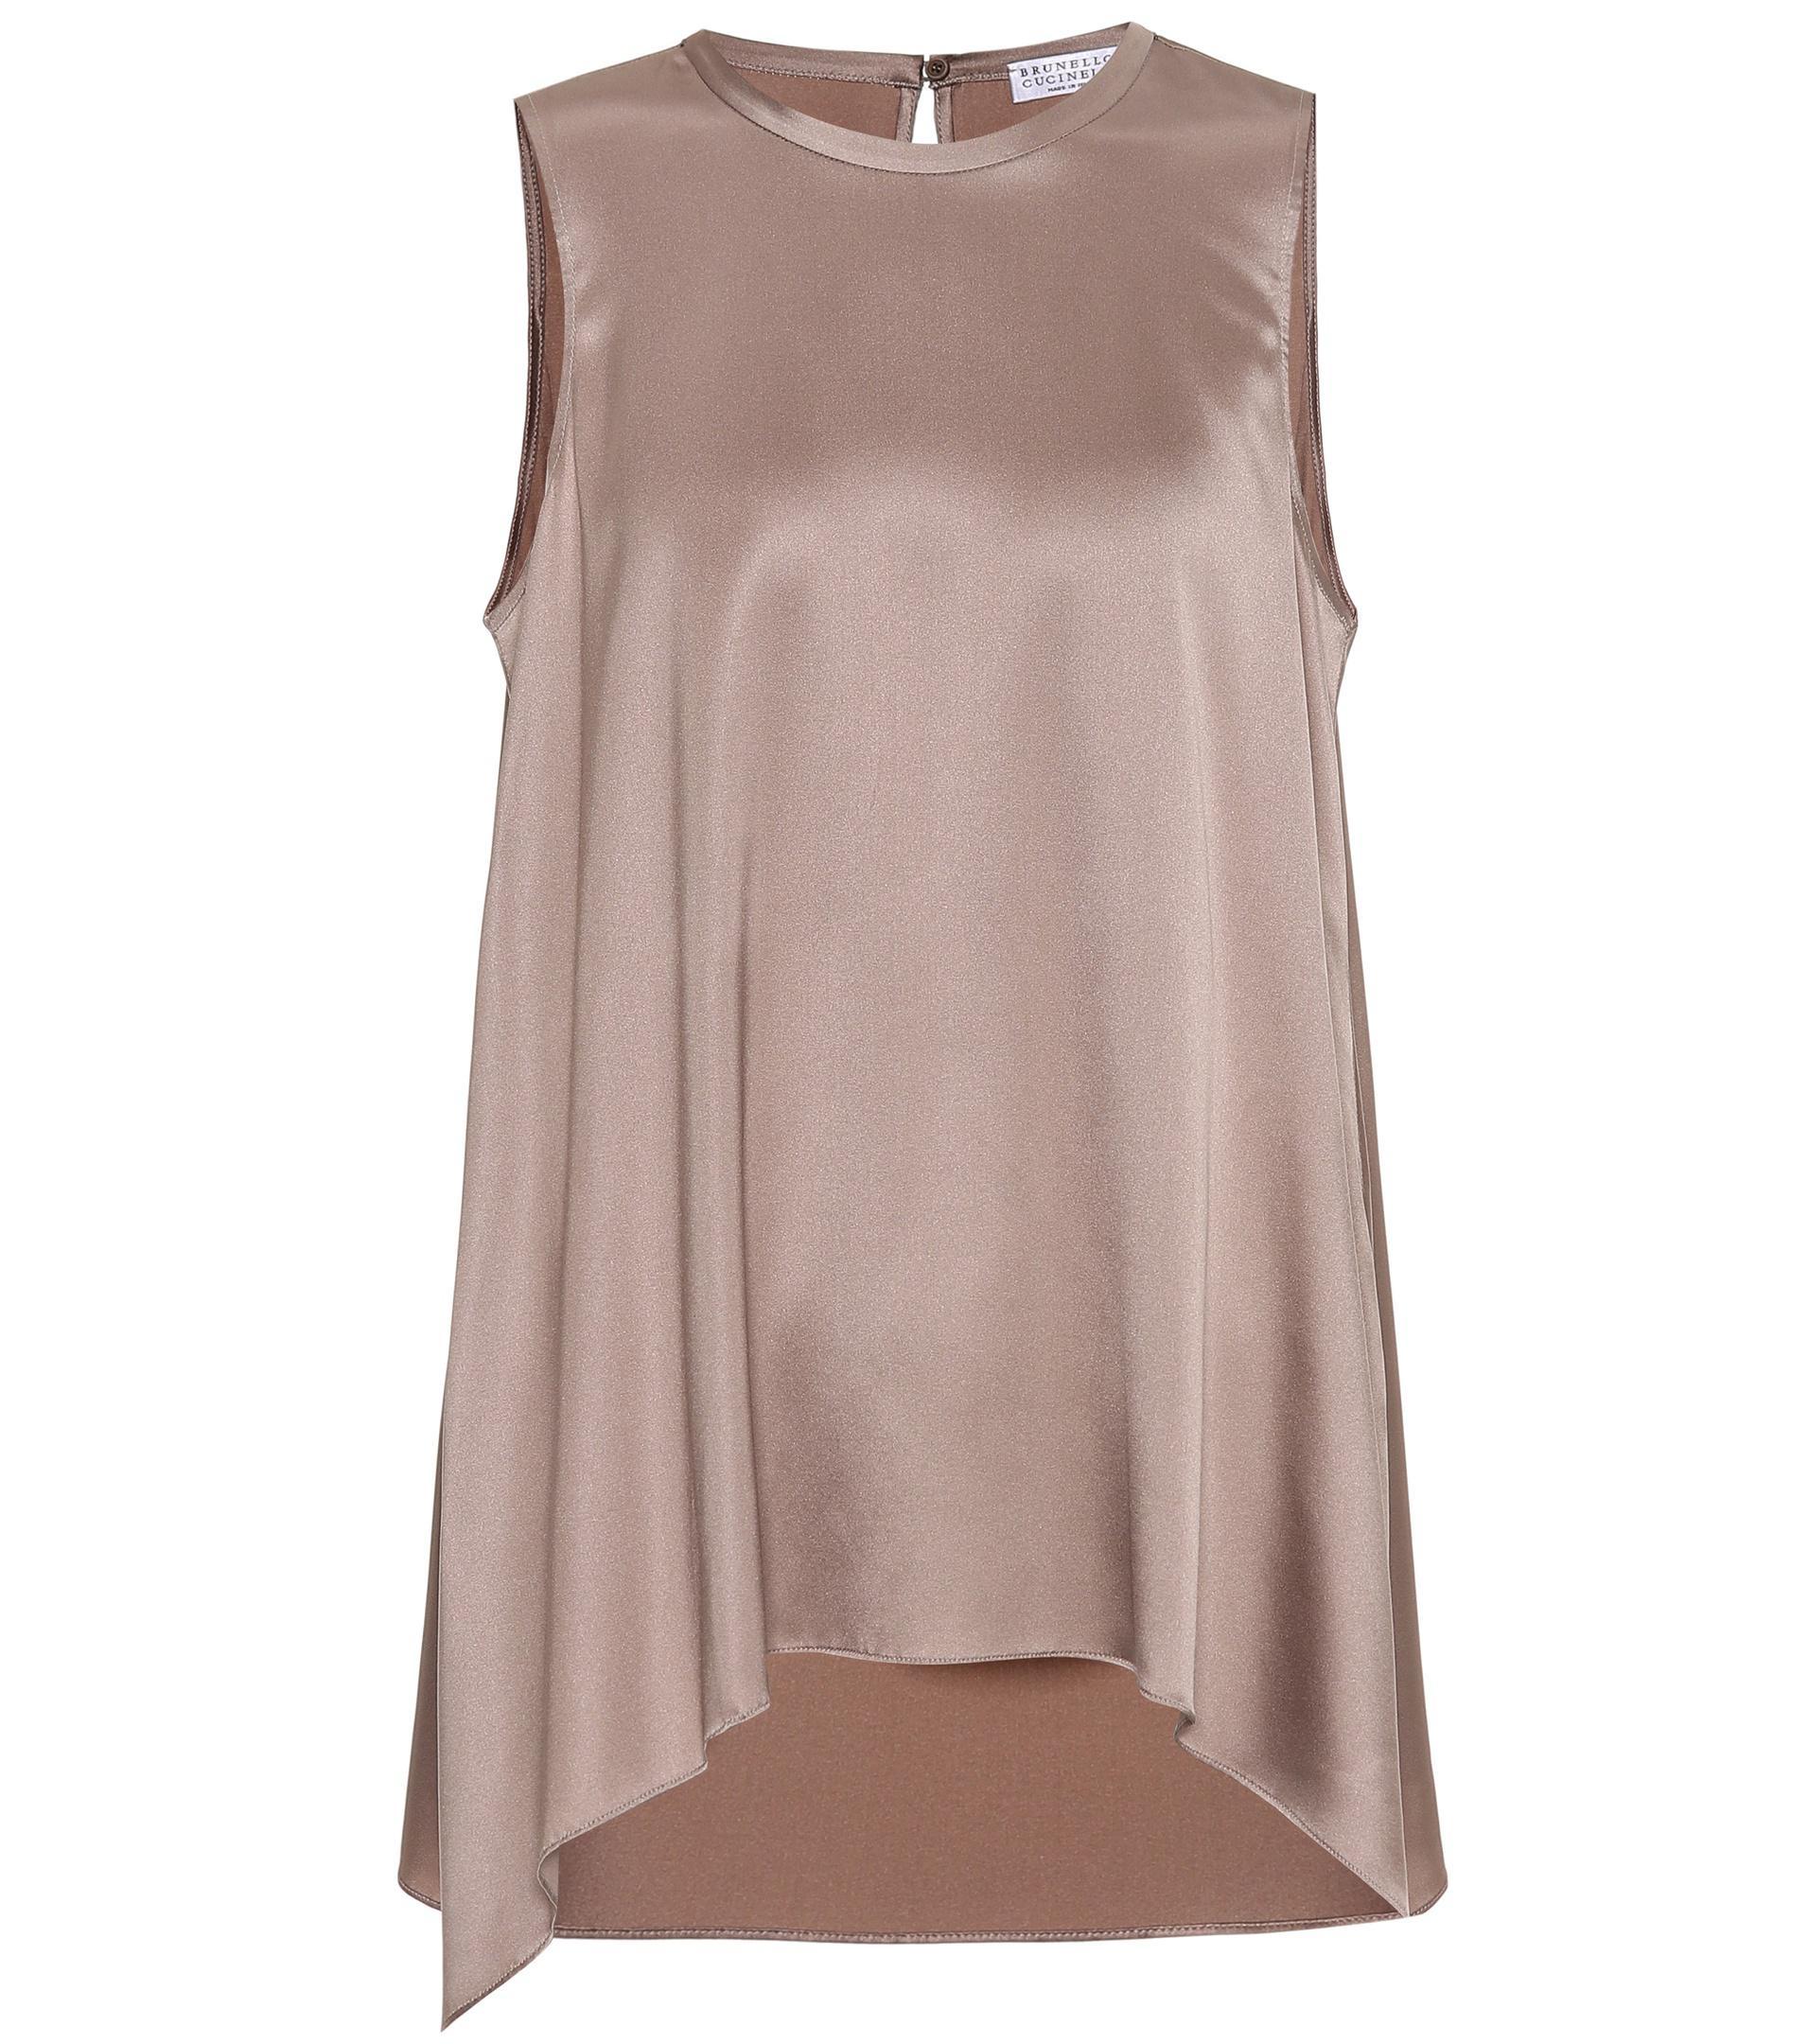 Official Site For Sale Cheap Price Asymmetric silk top Brunello Cucinelli Clearance Ebay cs8wmZiDvW